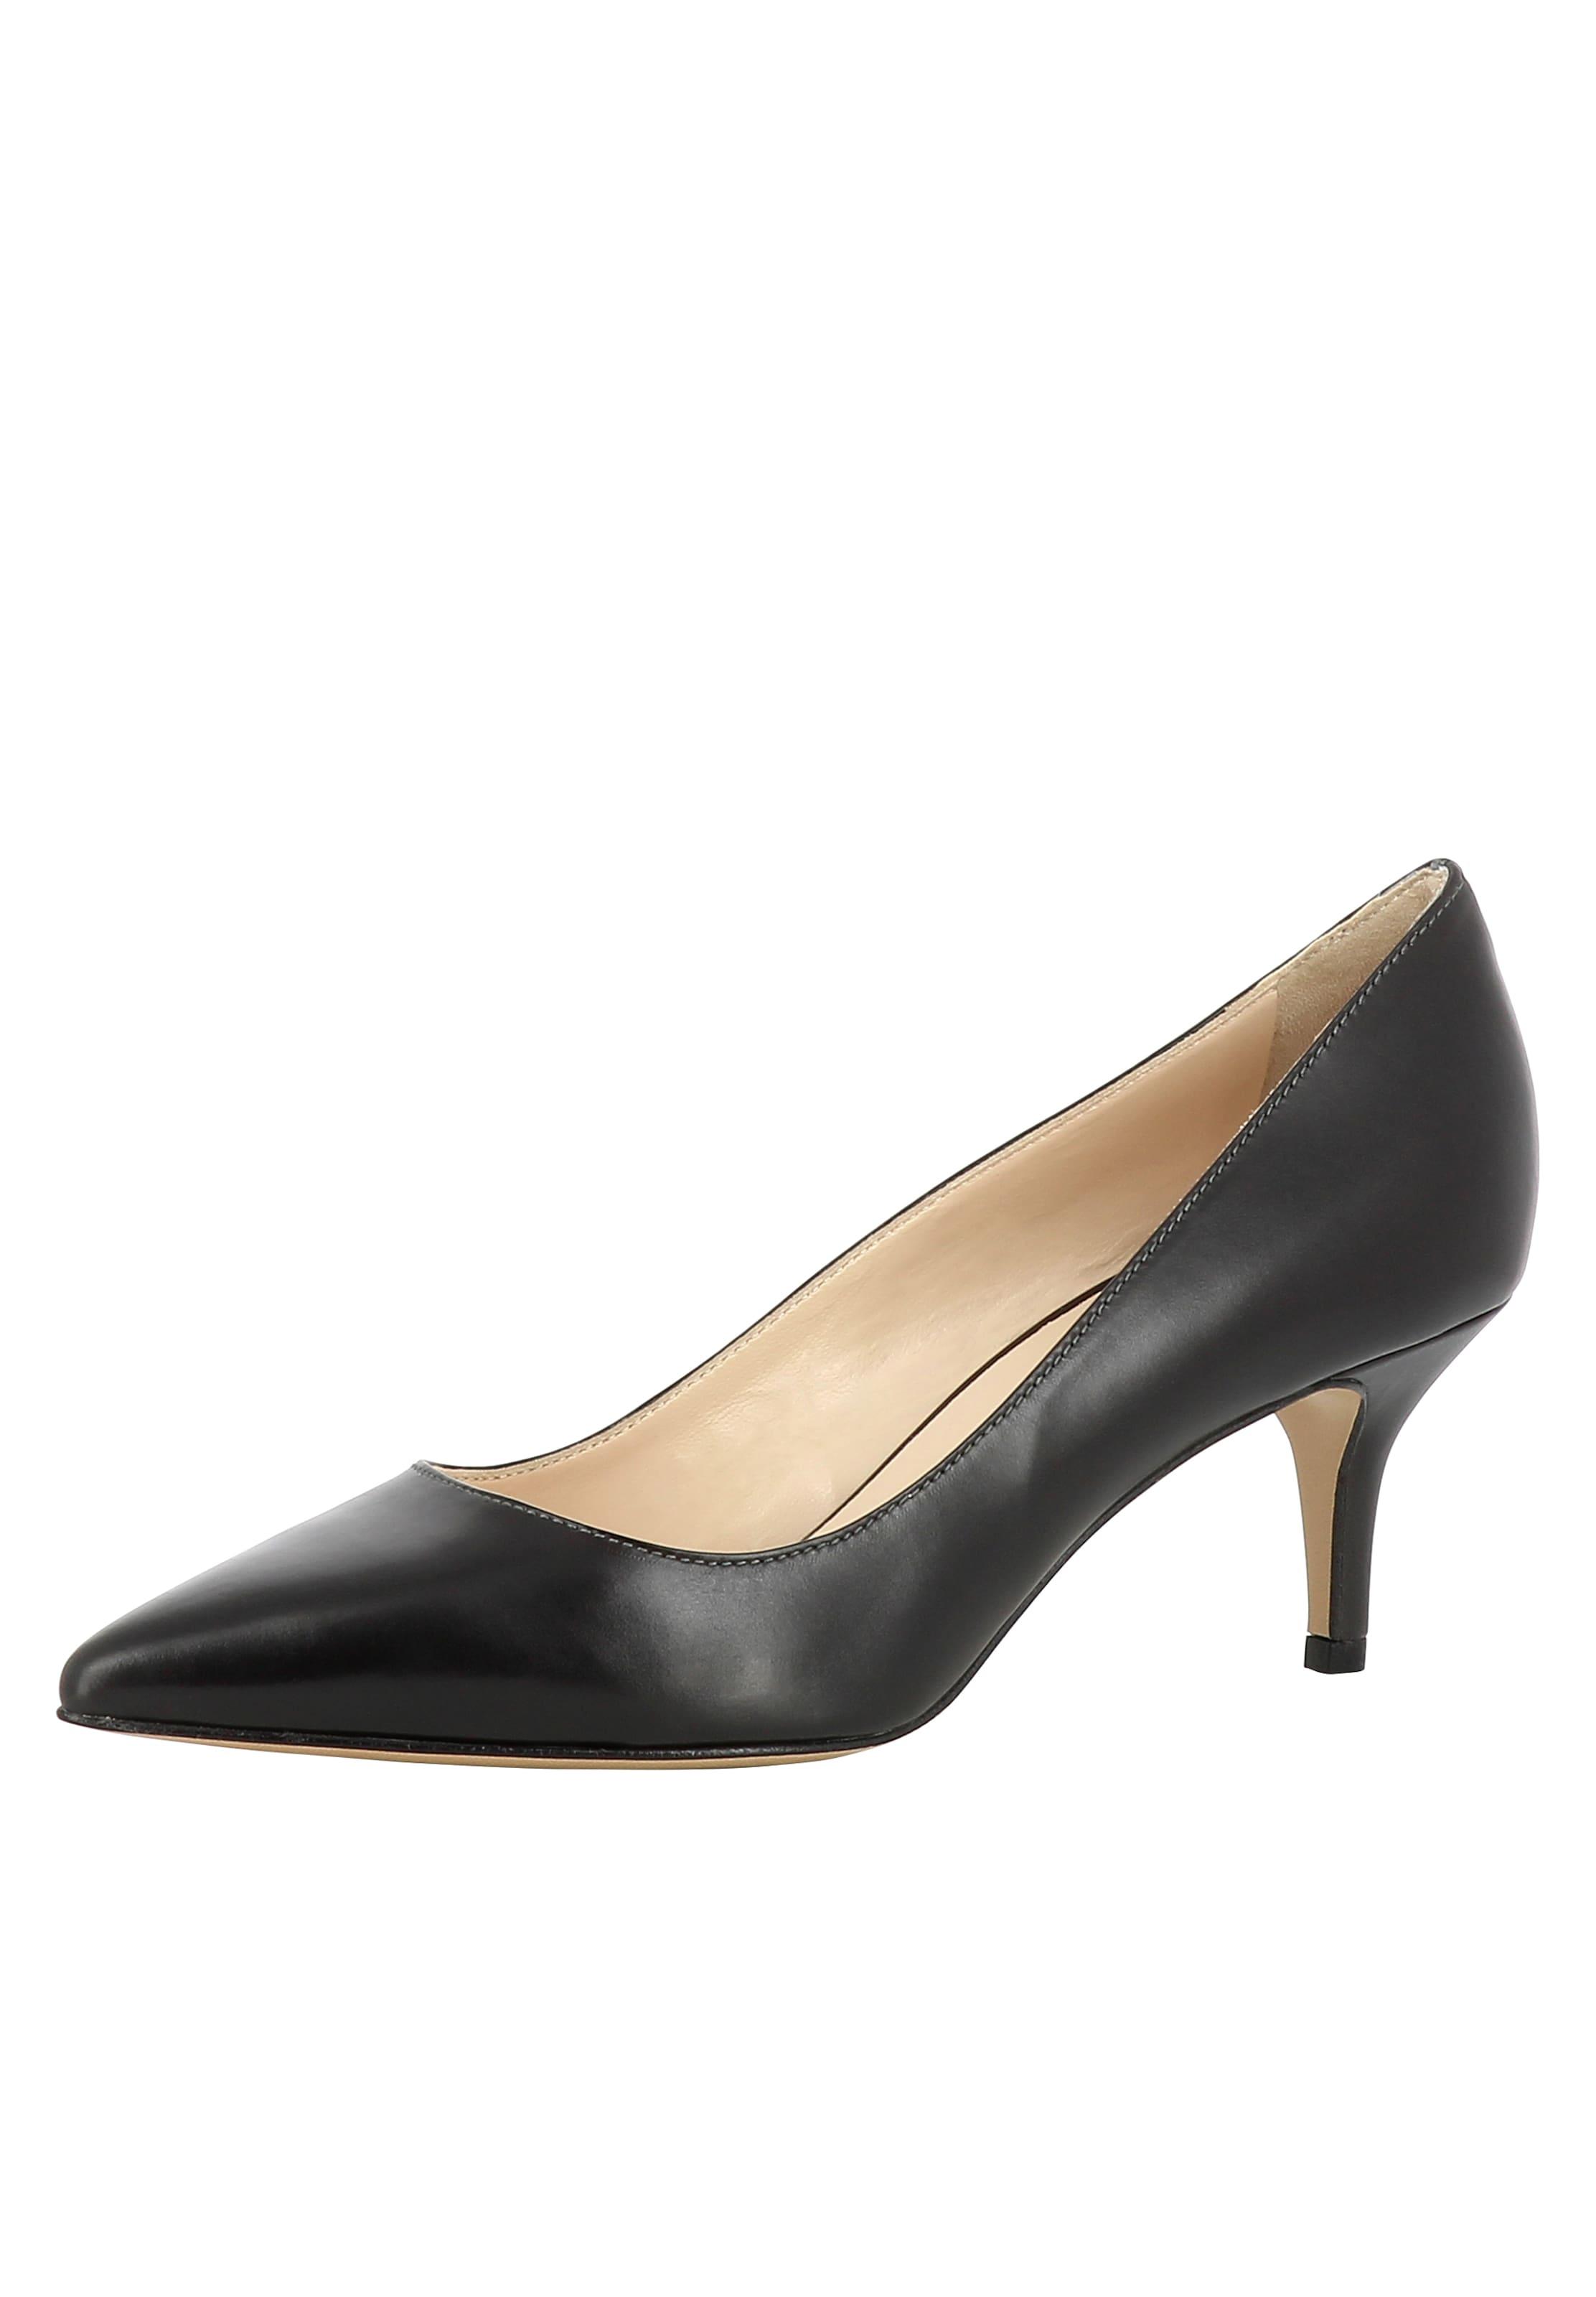 EVITA Damen Pumps GIULIA Verschleißfeste billige Schuhe